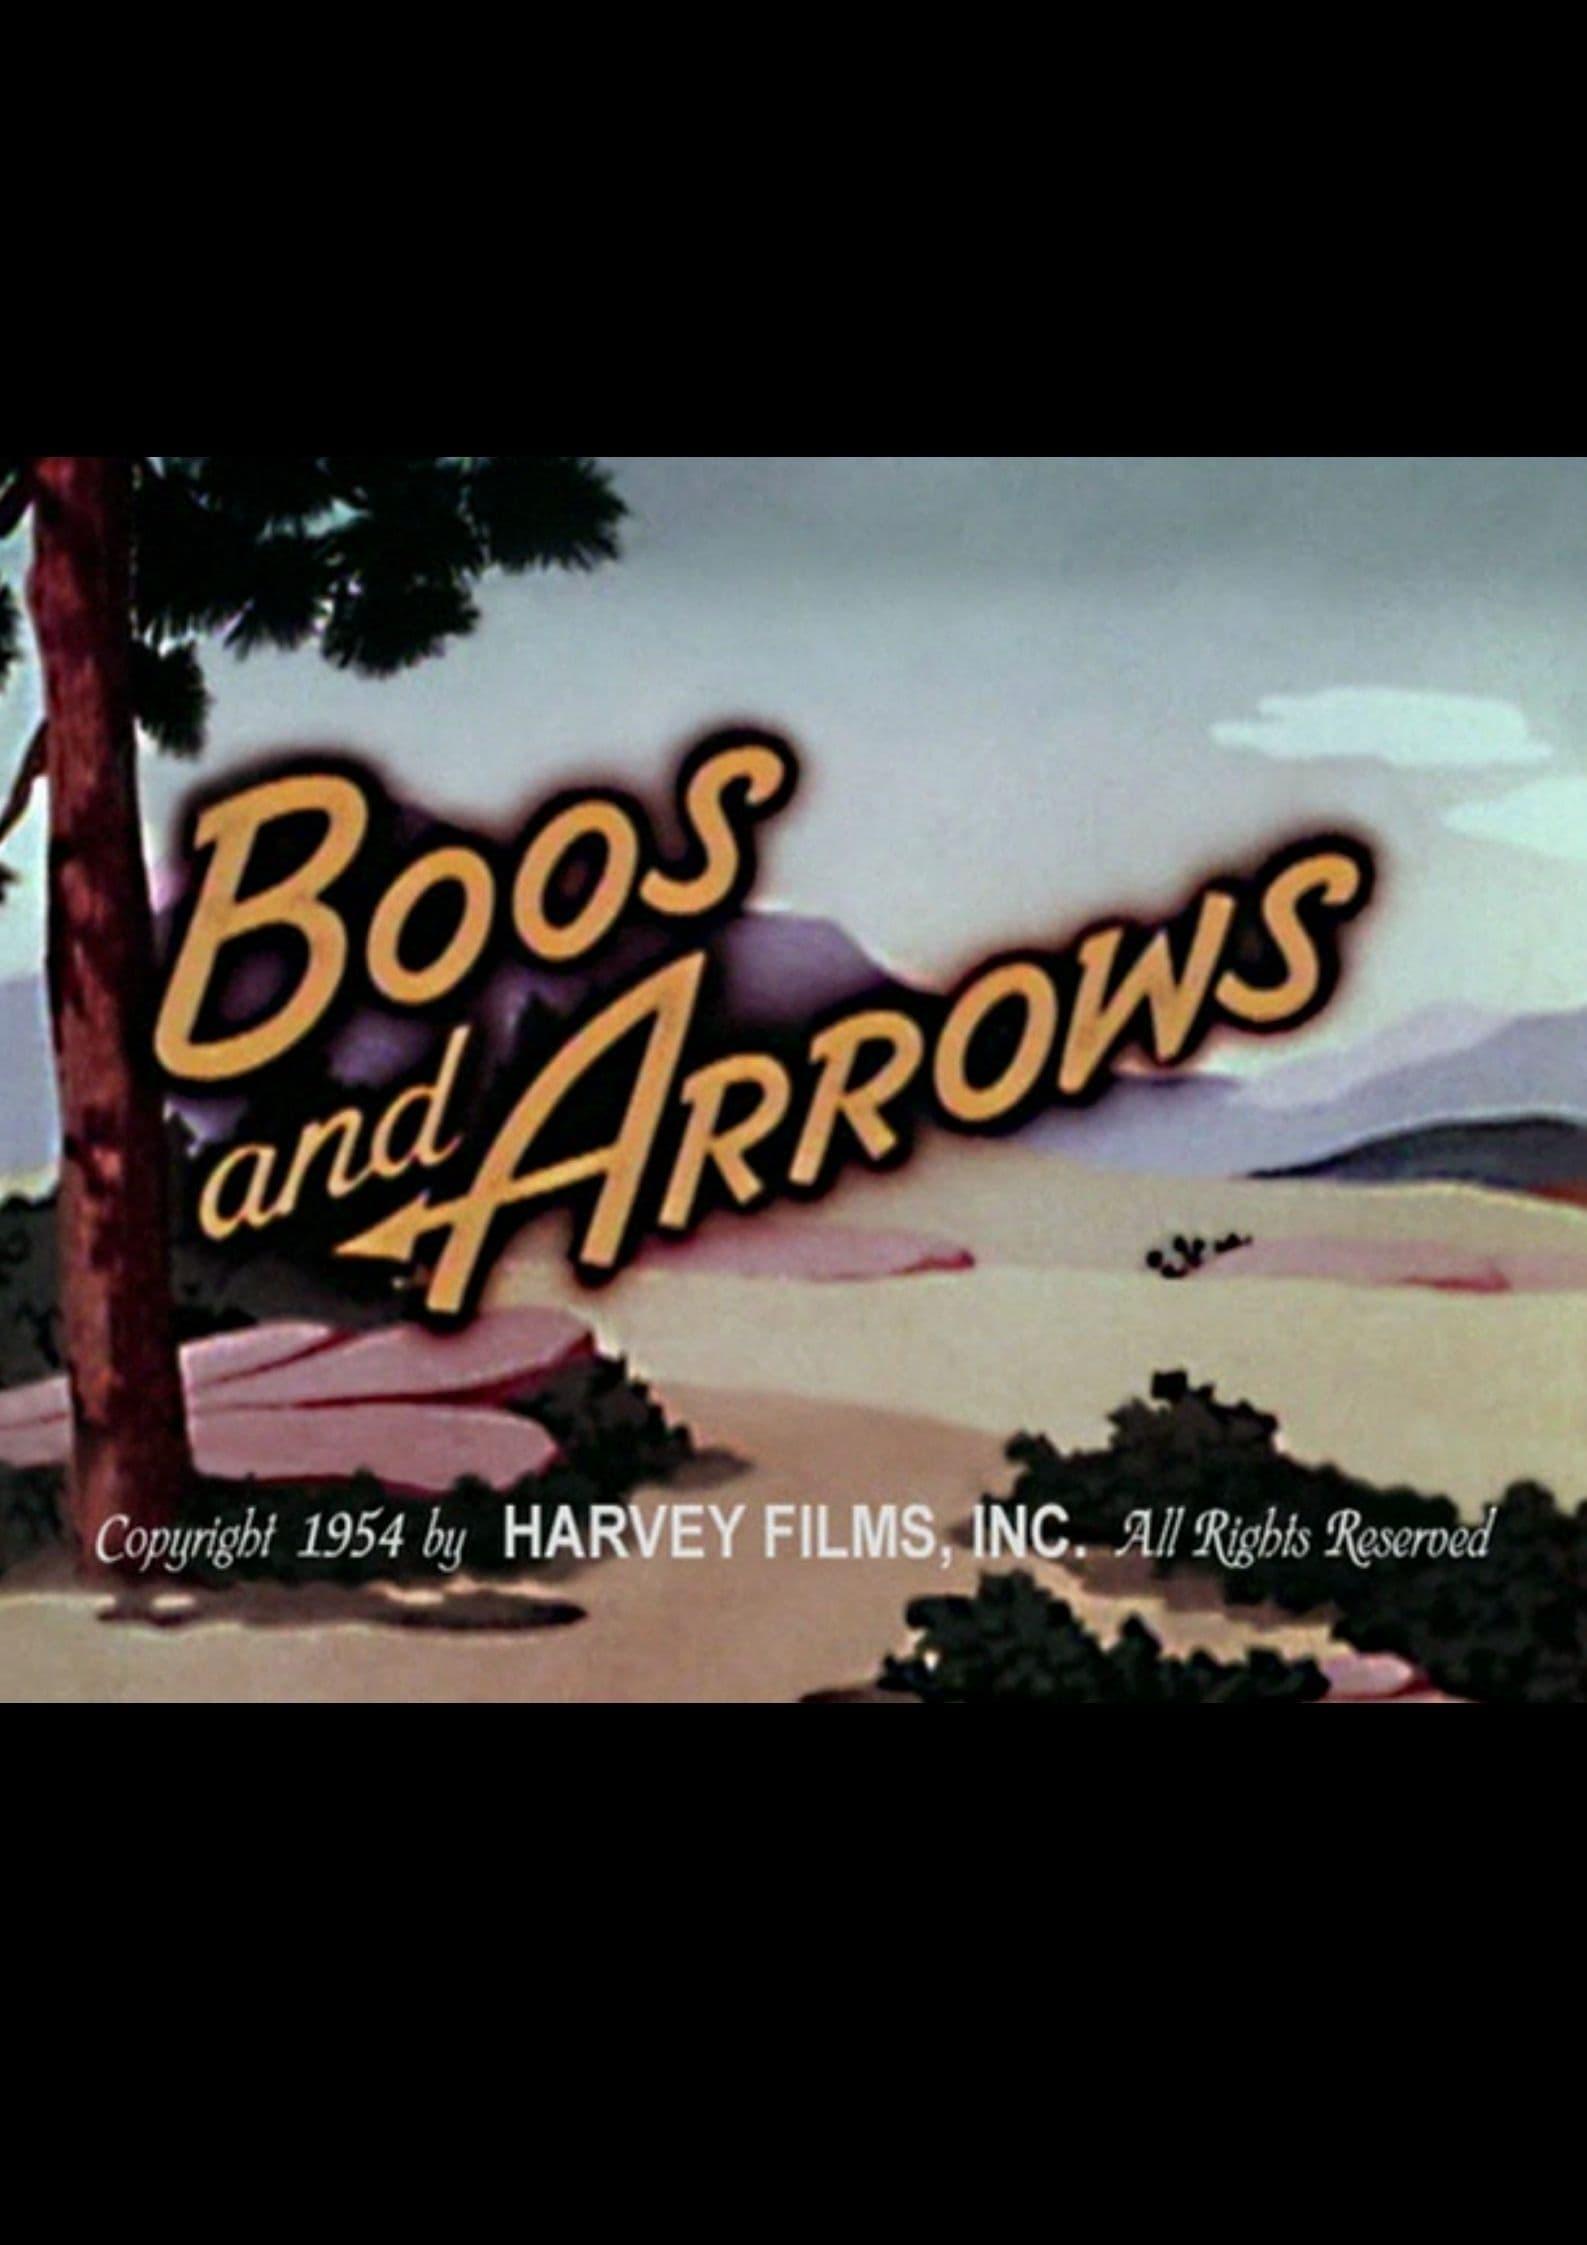 Boos and Arrows